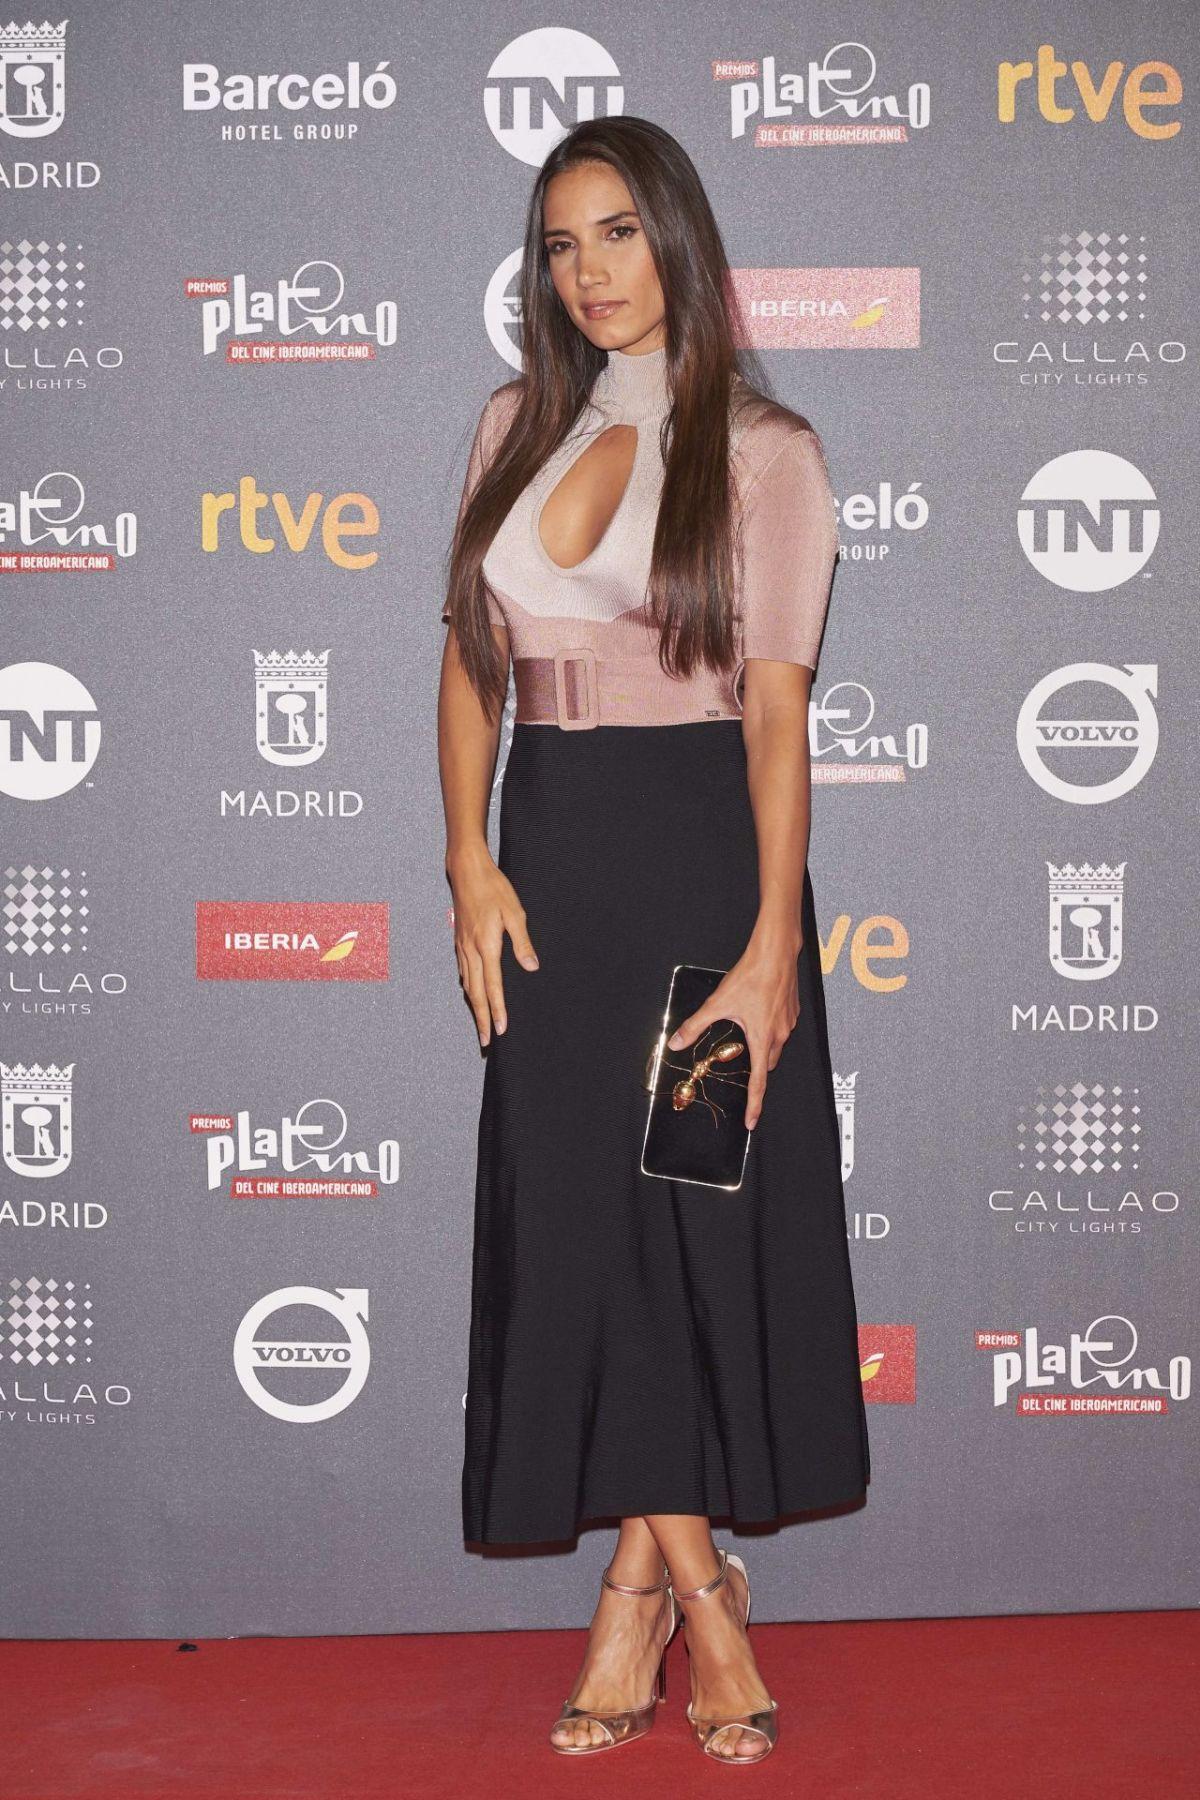 INDIA MARTINEZ at Platino Awards in Madrid 07/20/2017